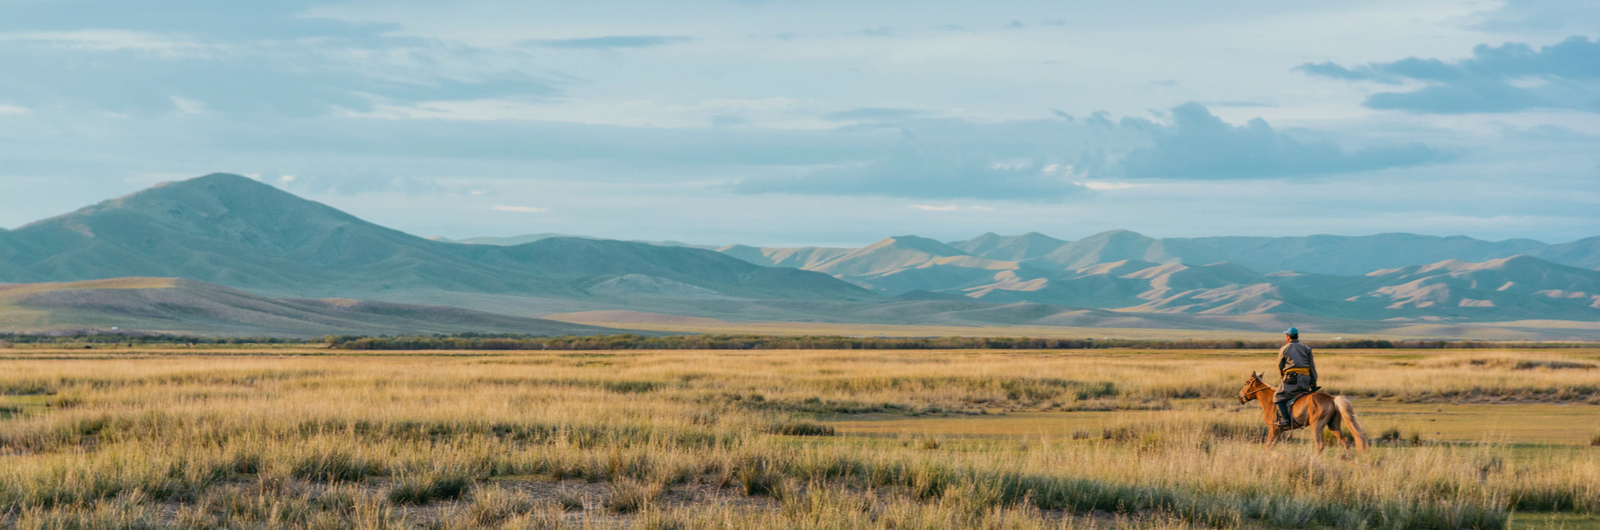 city header mongolia landscape